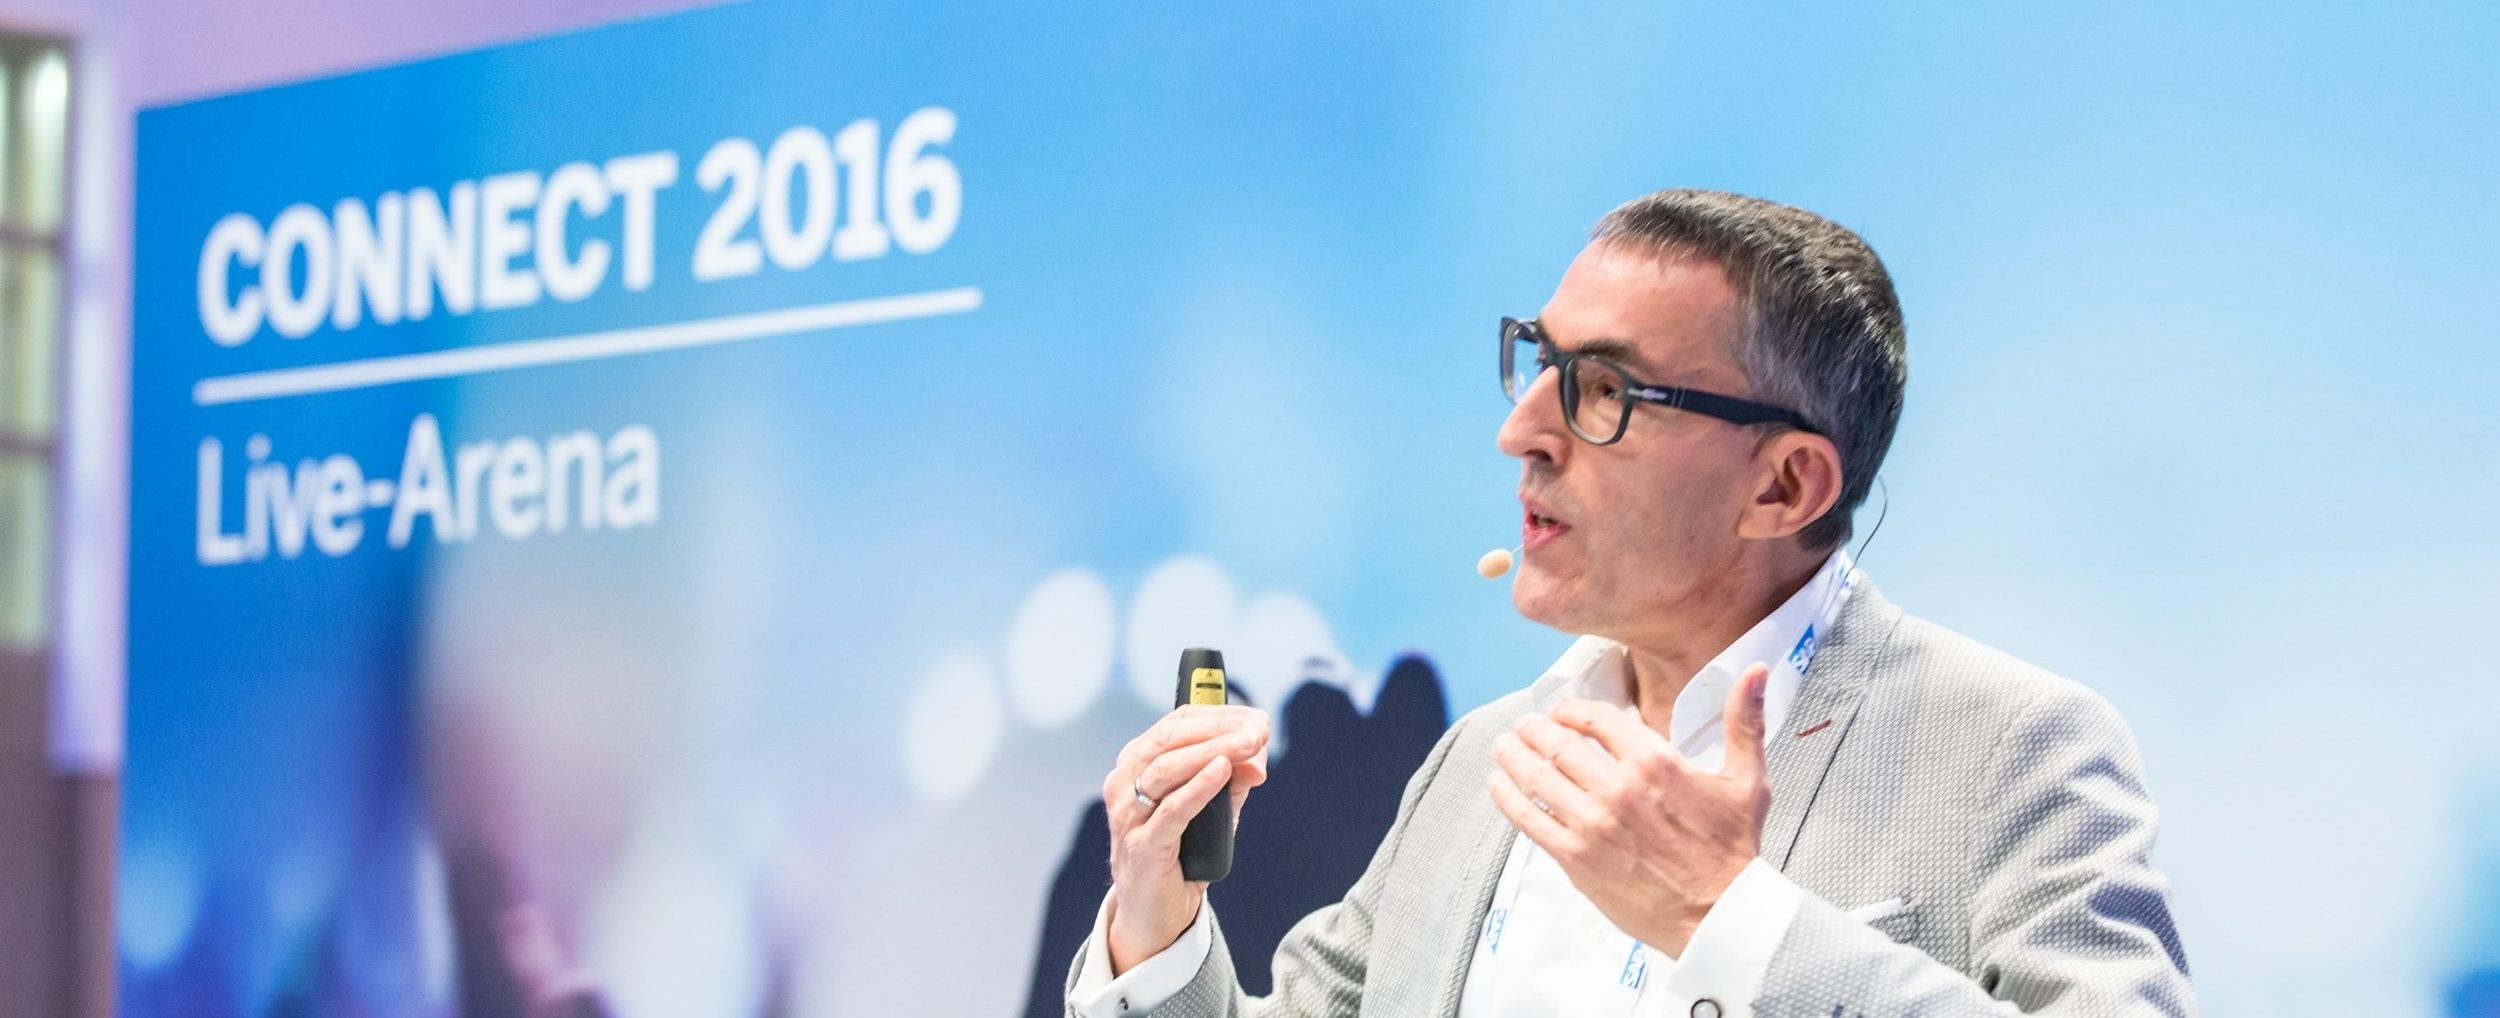 39-Ralf-Kreutzer-SAP-Connect-Vortrag-FFM-IV-2016-e1499982210493